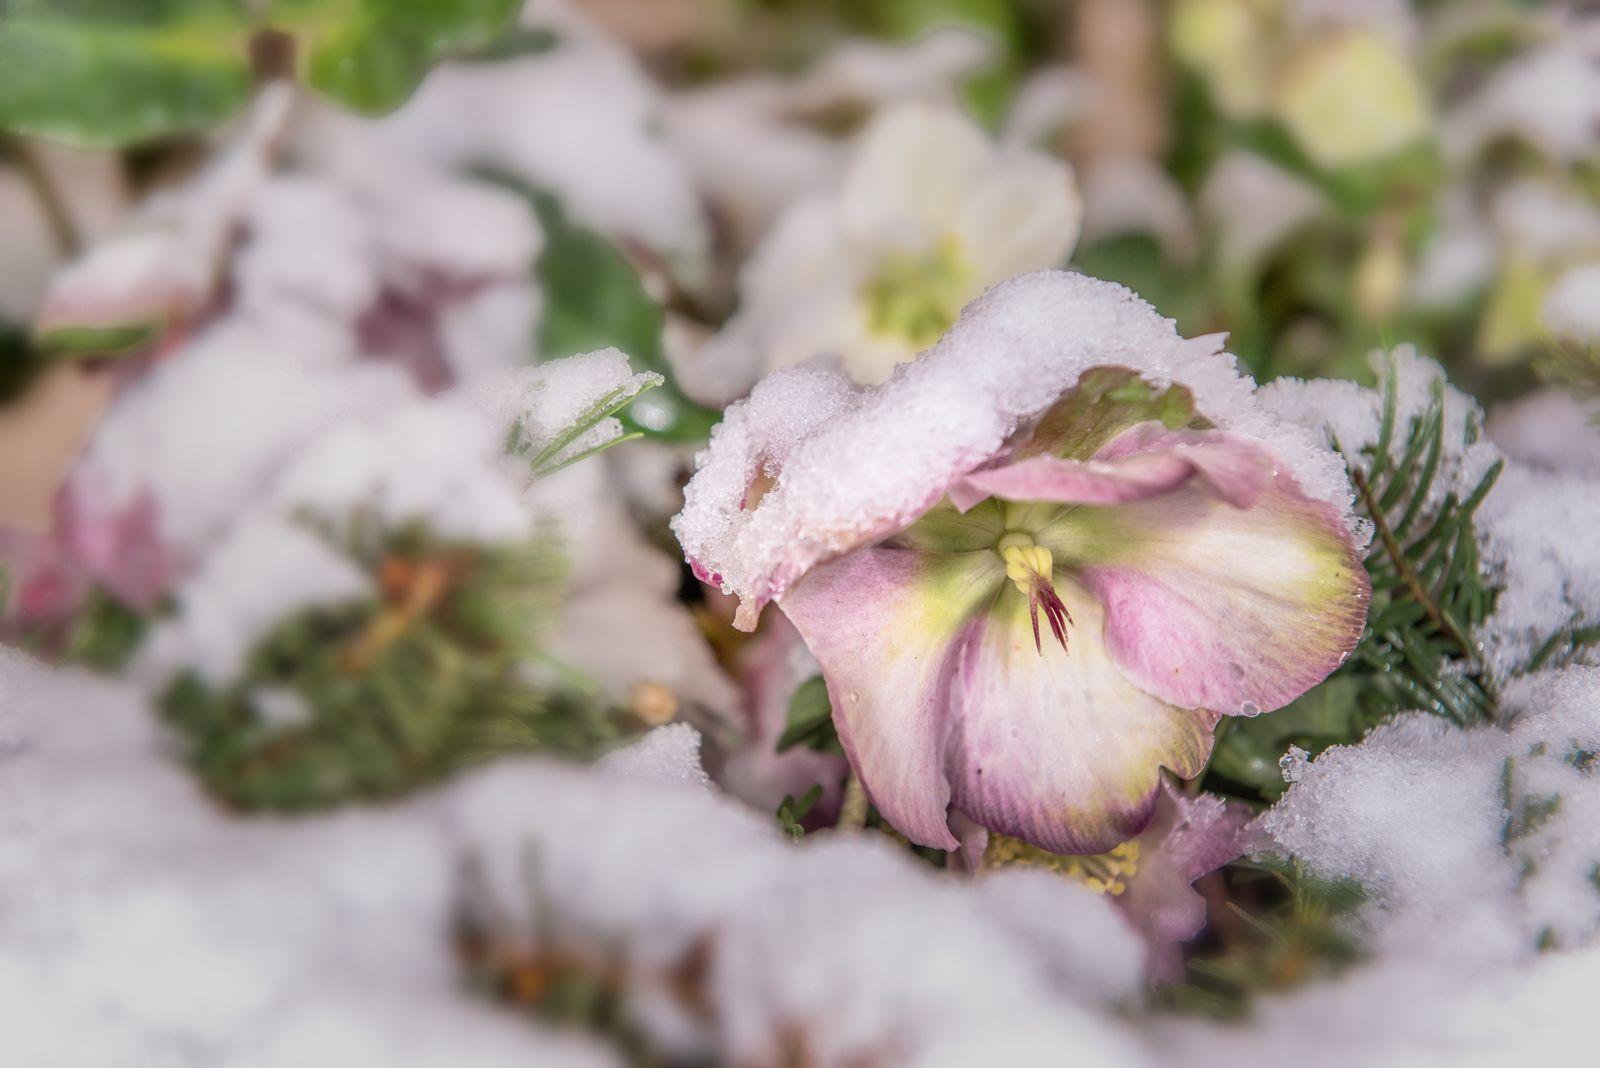 Winterharte Blumen Diese Robusten Sorten Trotzen Dem Winter Winterharte Blumen Winterhart Und Einjahrige Pflanzen